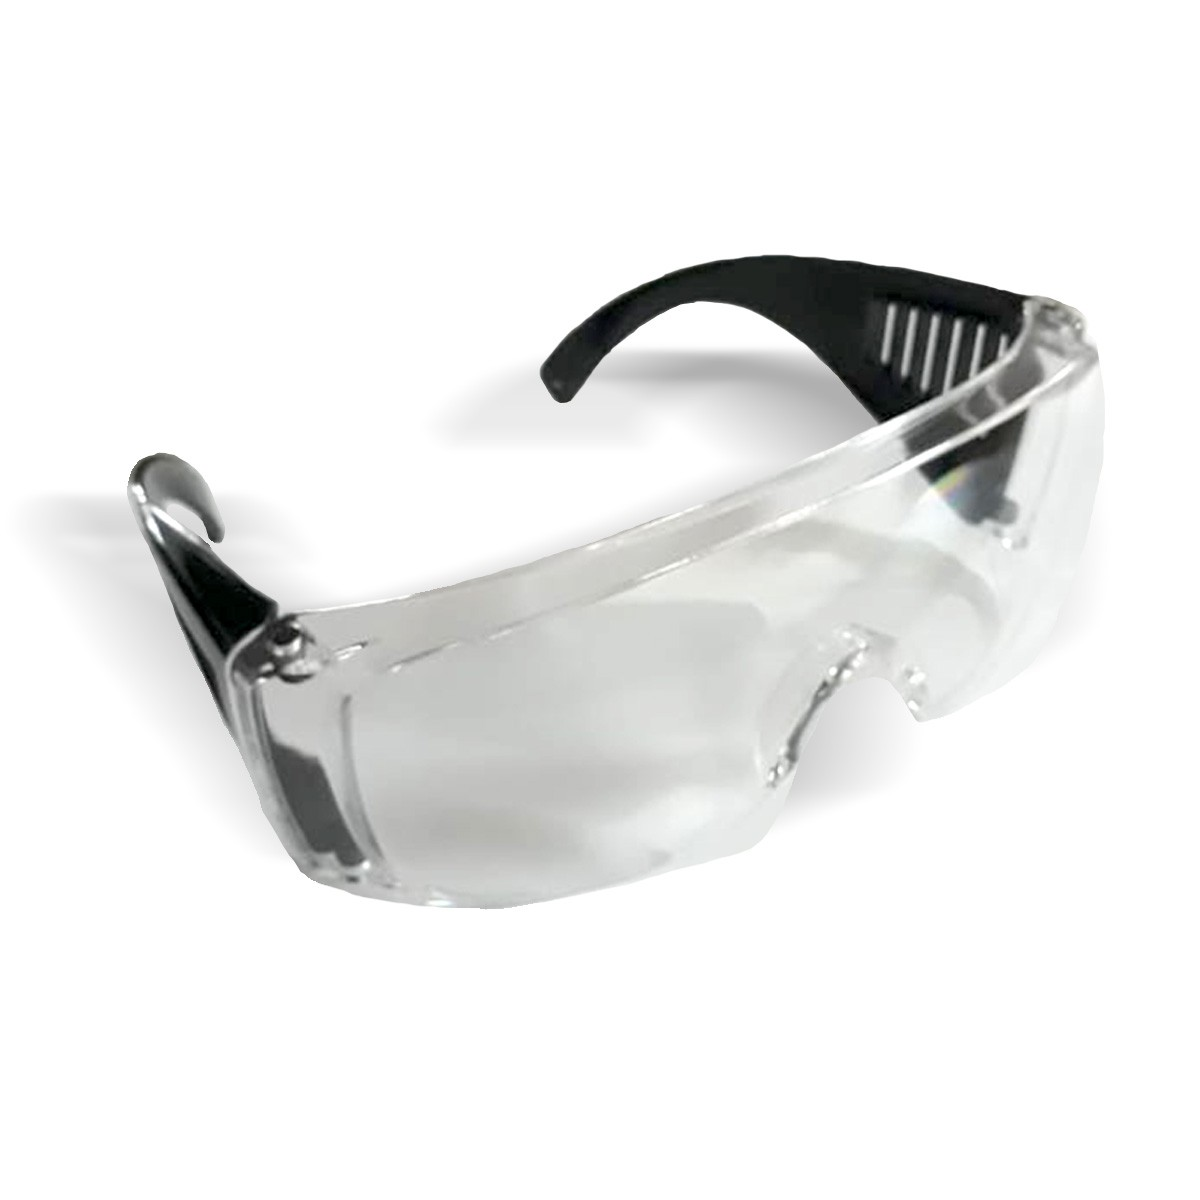 Óculos De Segurança Pro-Vision Incolor - CARBOGRAFITE